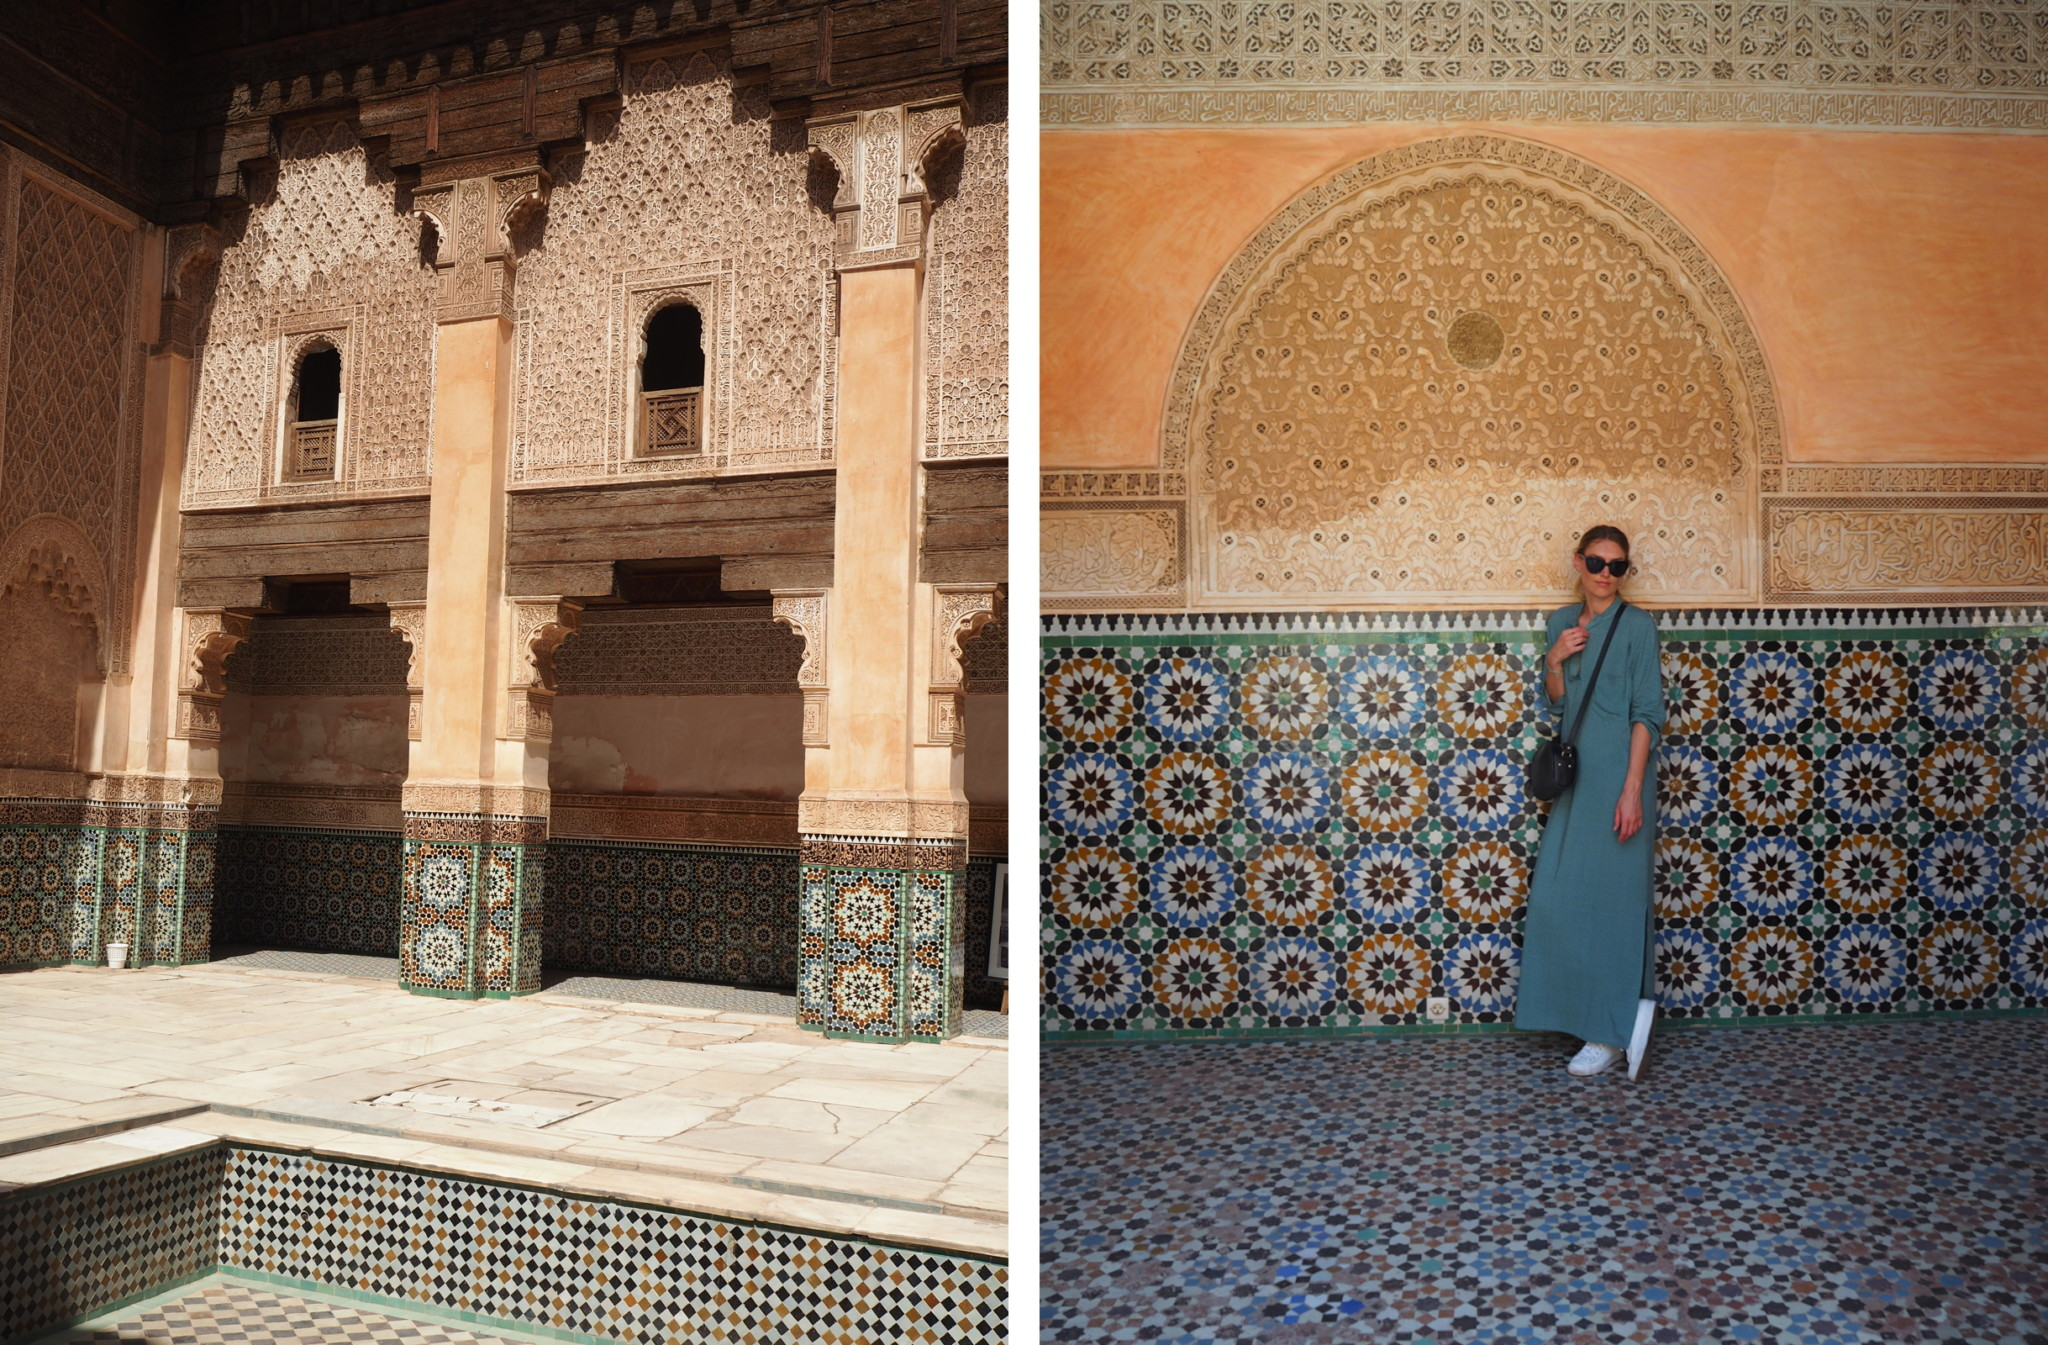 bare-minds-elina-neumann-marrakesch-marokko